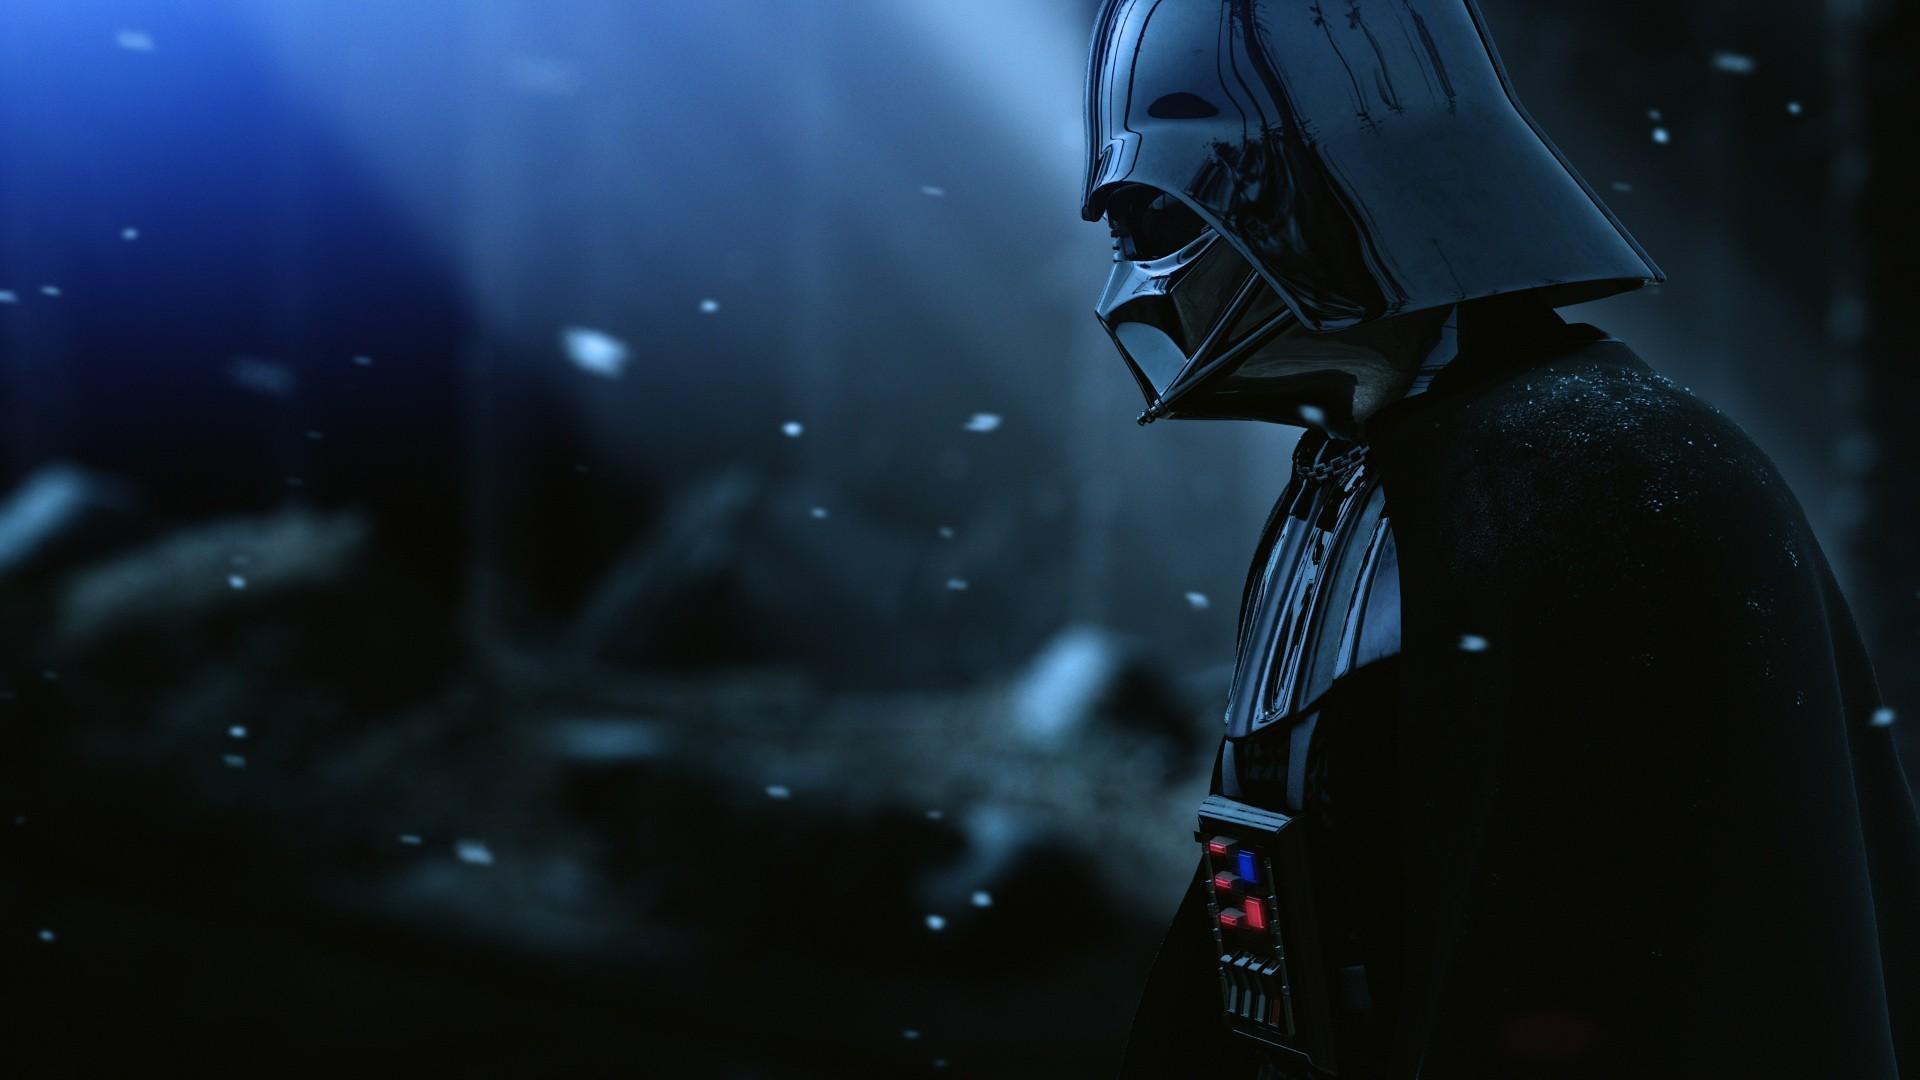 Star Wars 1080p Wallpaper Pack Vidiny 1920x1080